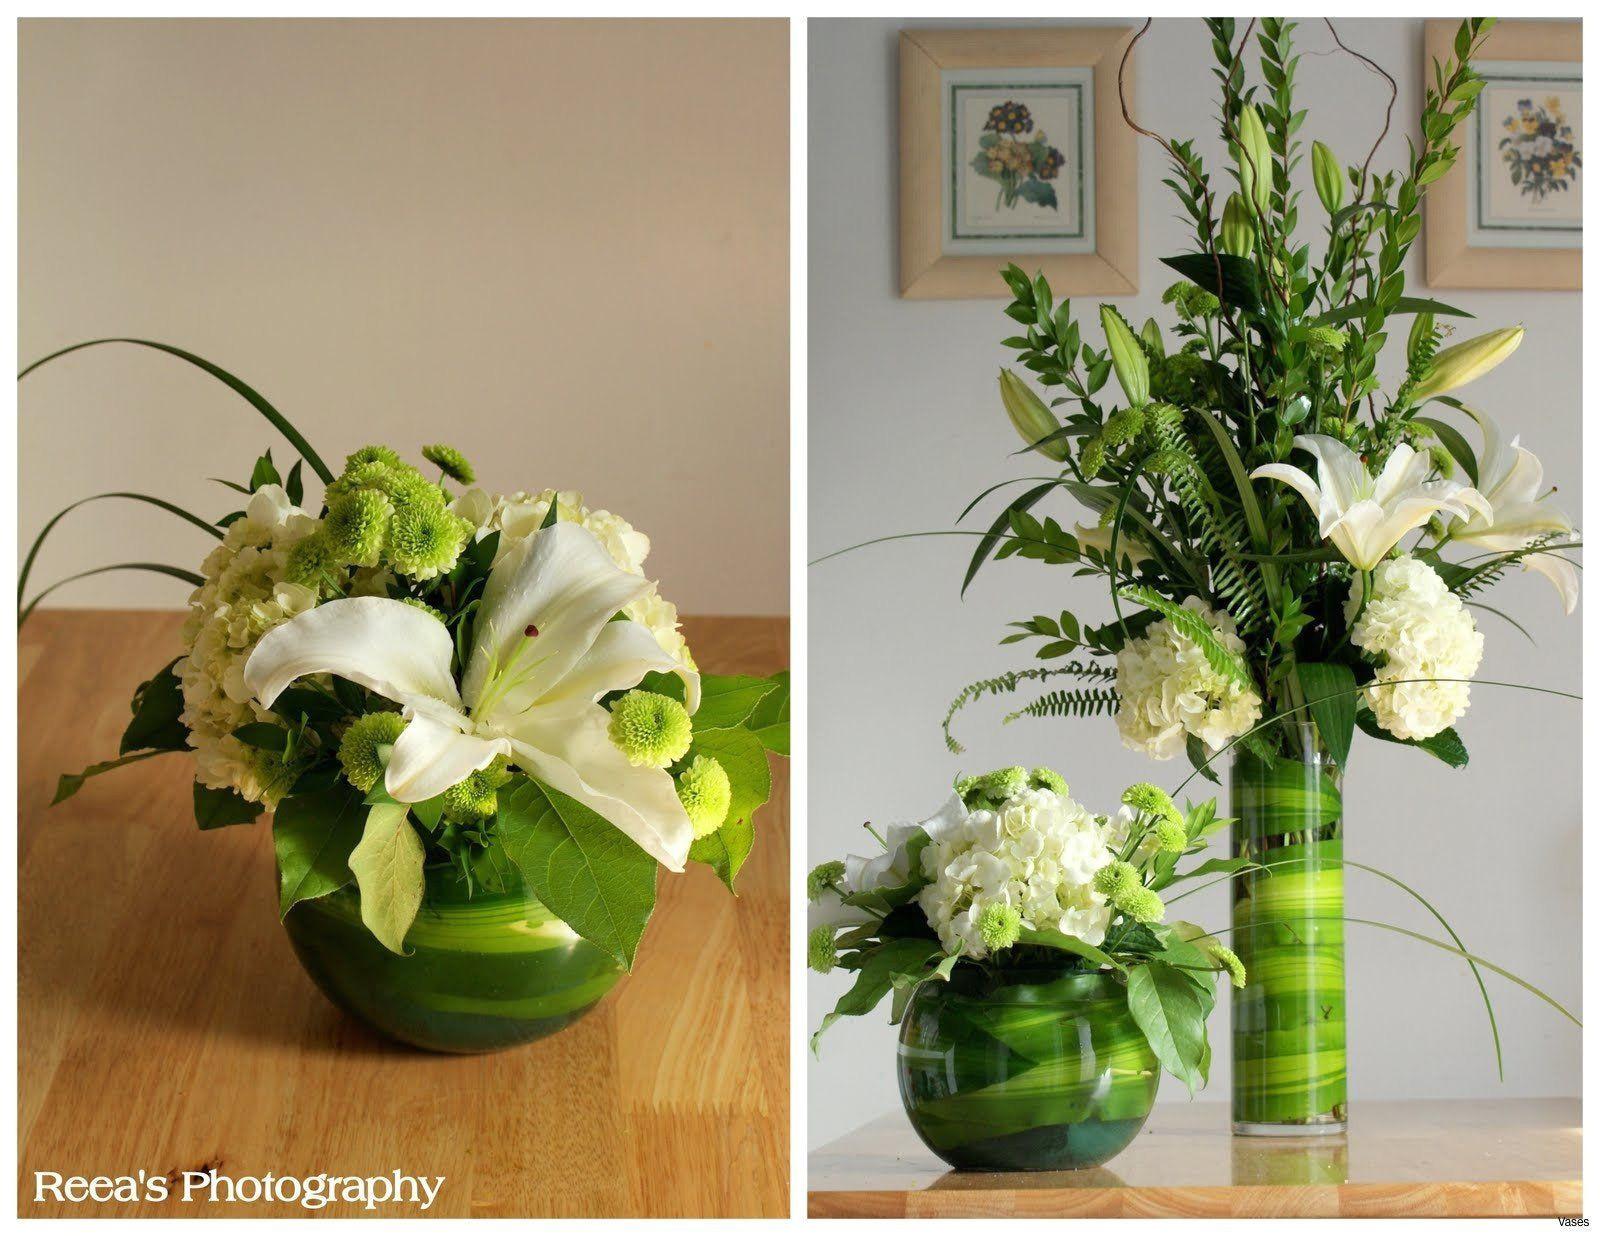 flower vase price of 21 flower arrangement in vase the weekly world regarding 21 flower arrangement in vase